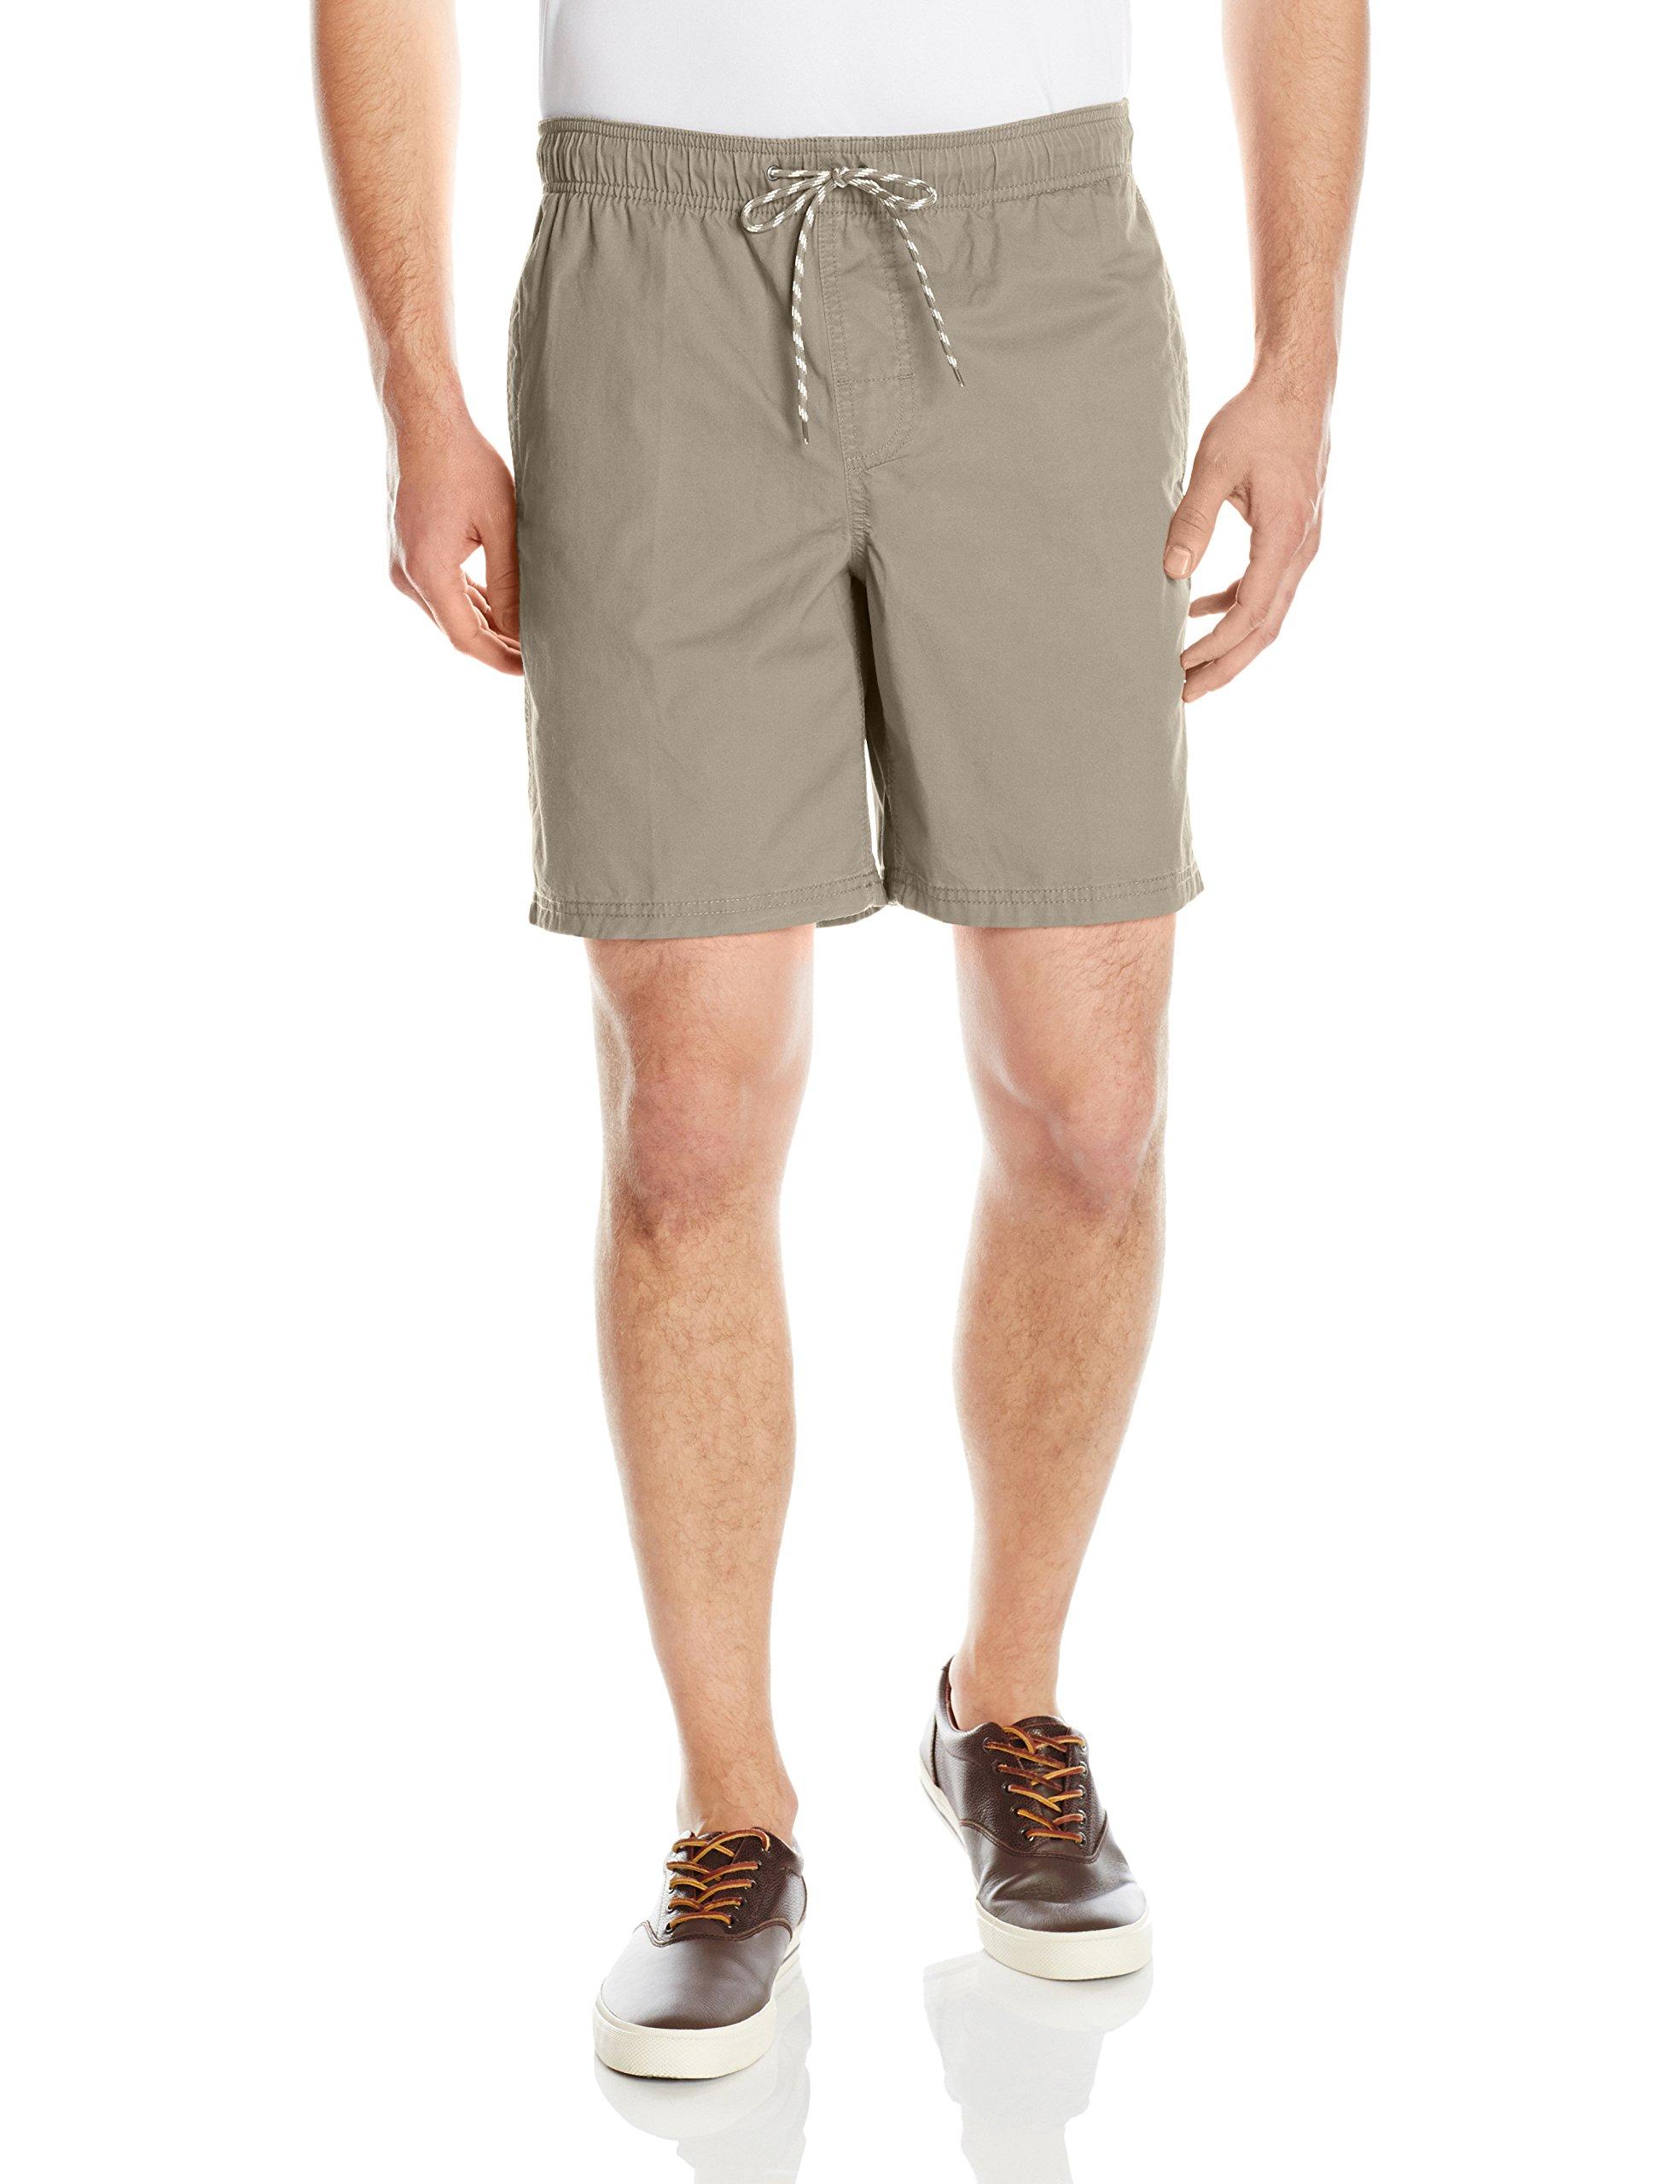 Amazon Essentials Men's Drawstring Walk Short, Khaki, Large by Amazon Essentials